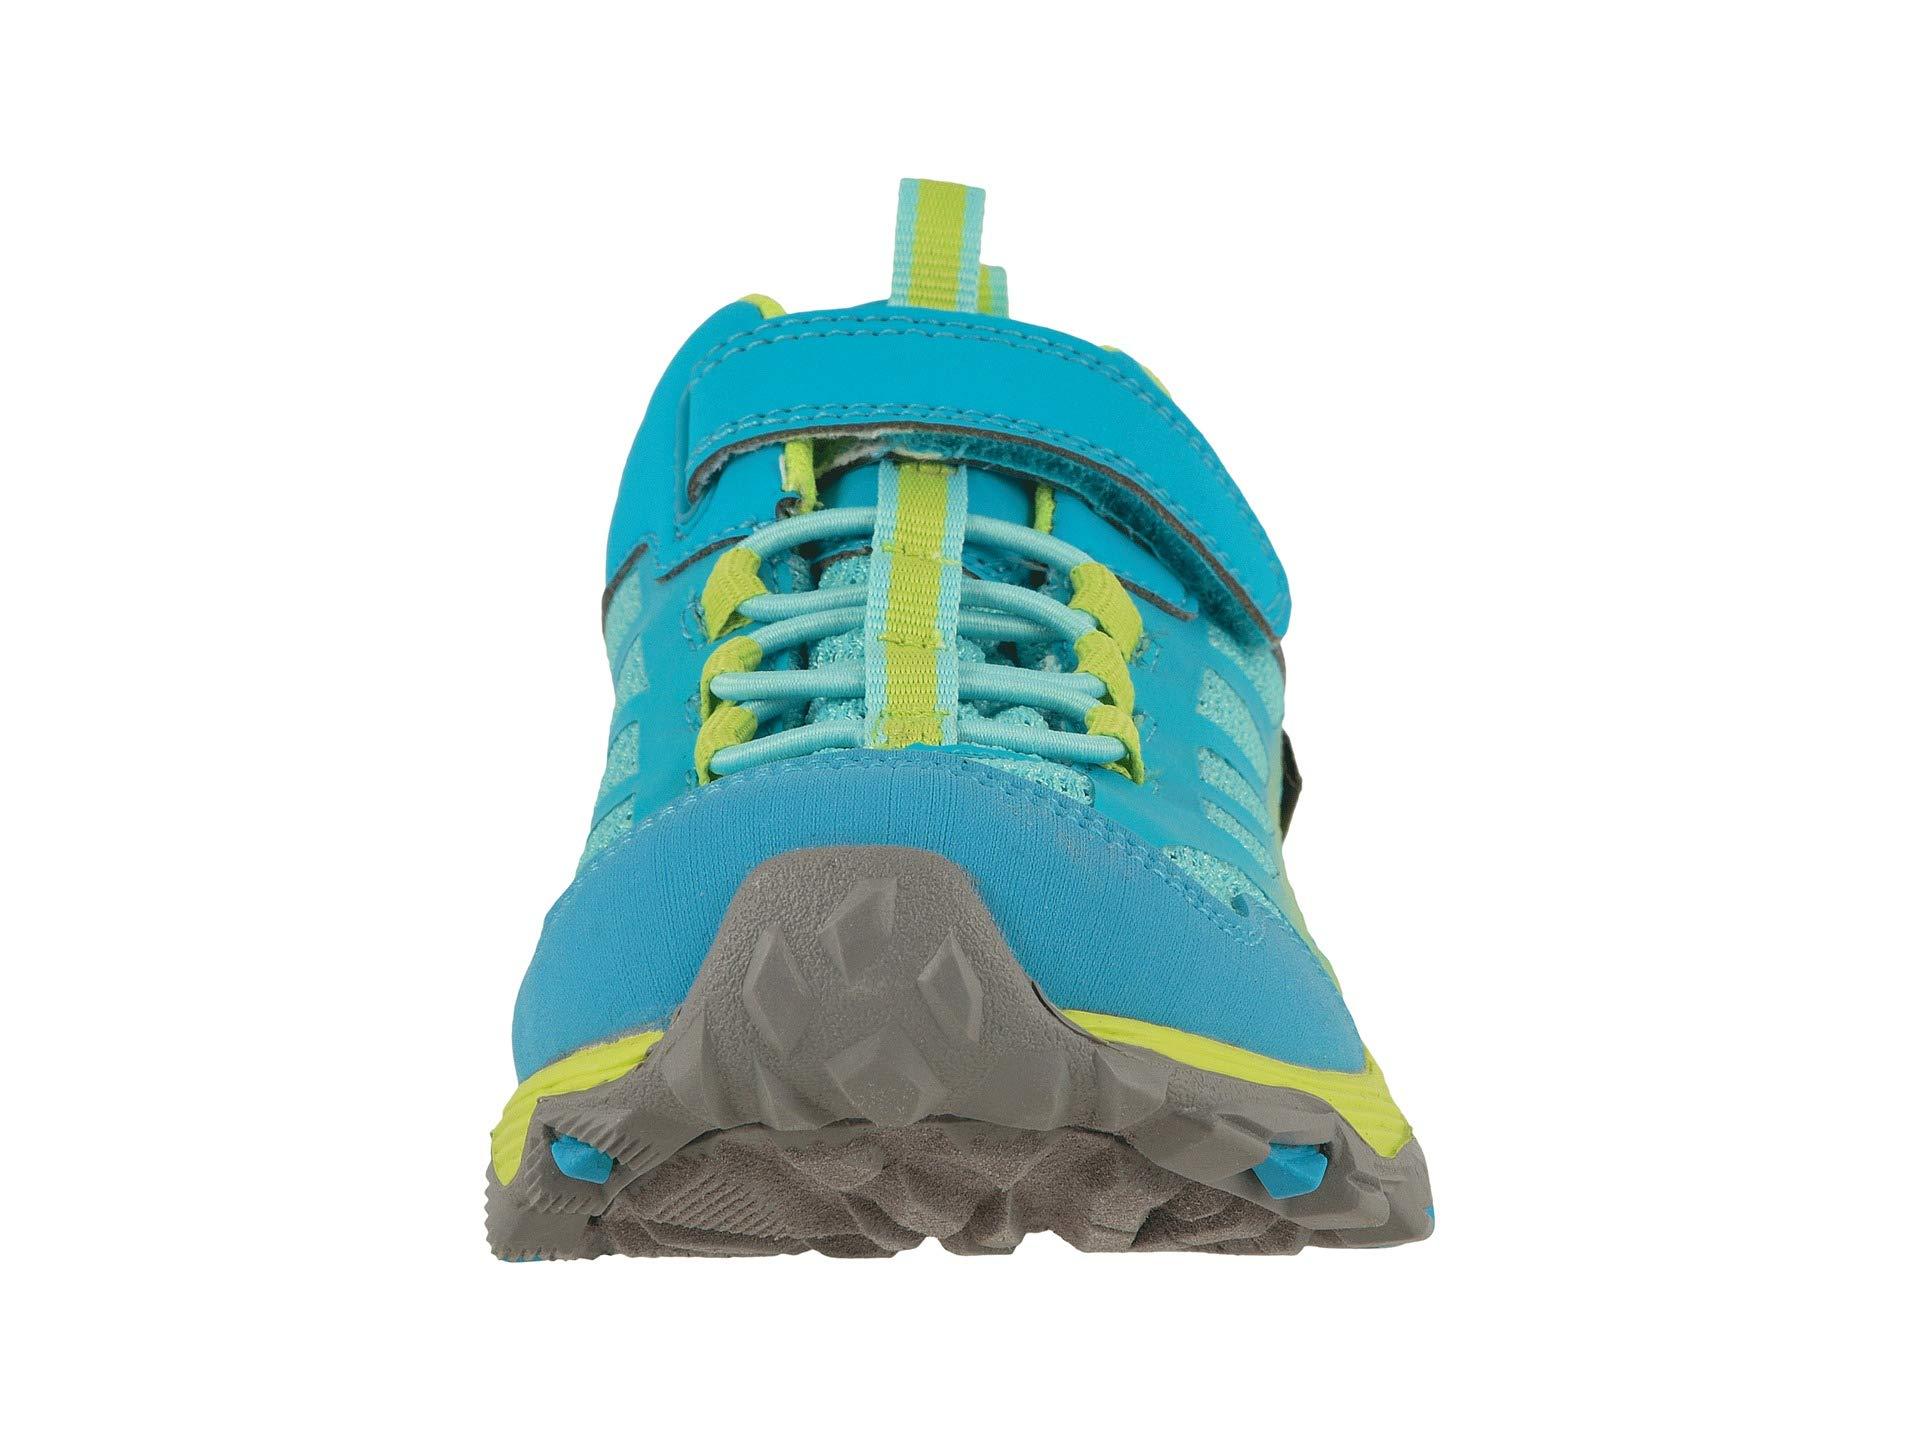 Merrell Girls' Moab FST Low A/C WTRPF Hiking Shoe, Turq/Lime, 13.5 M US Little Kid by Merrell (Image #5)